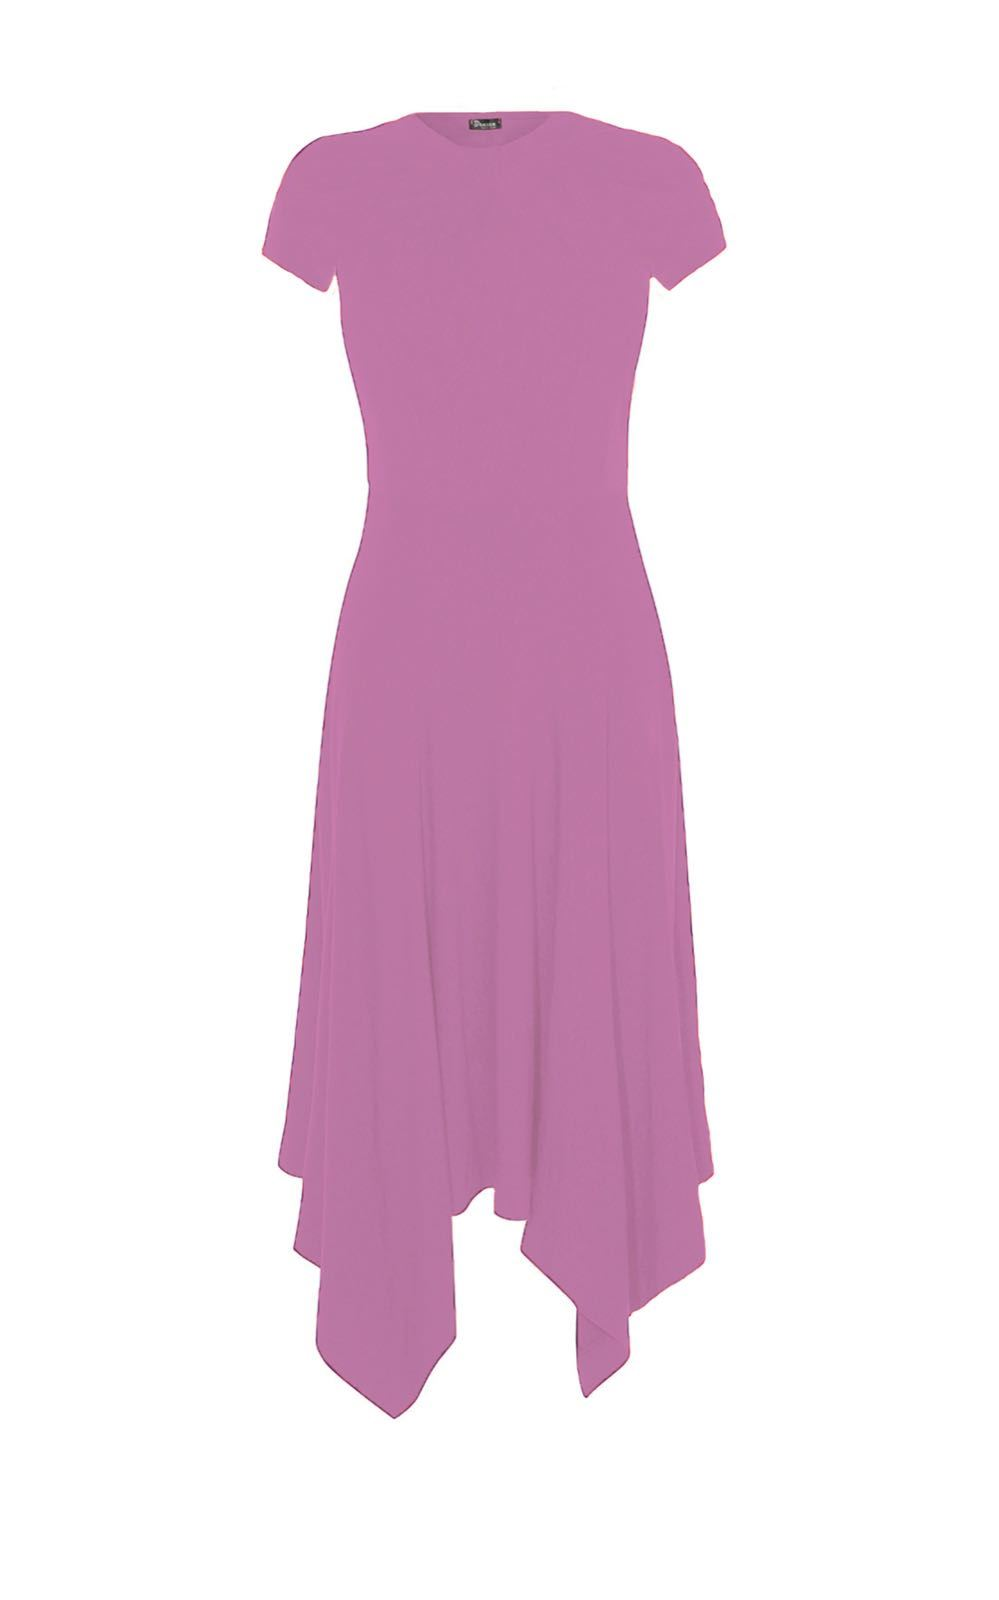 Womens-Crew-Neck-Summer-Party-Flared-Ladies-Hankey-Hem-Long-Swing-Dress-8-26